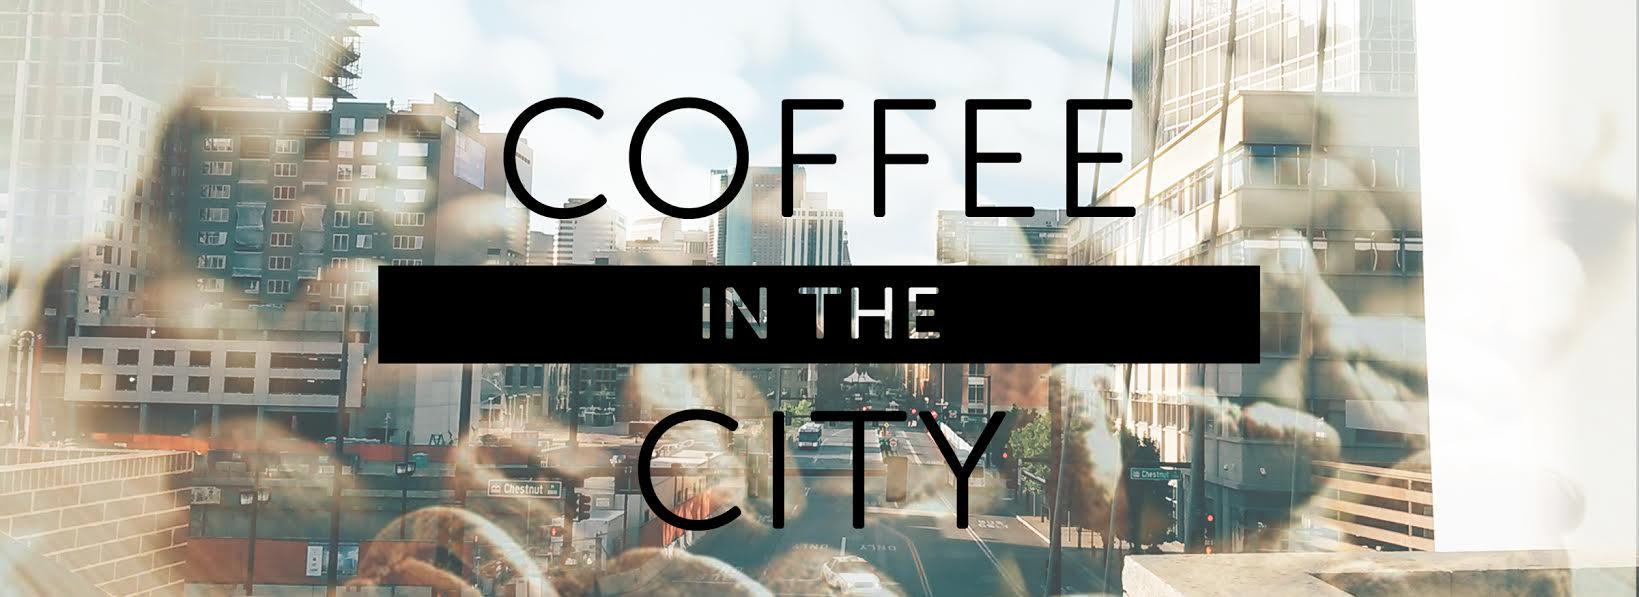 Coffeeinthecity.jpg